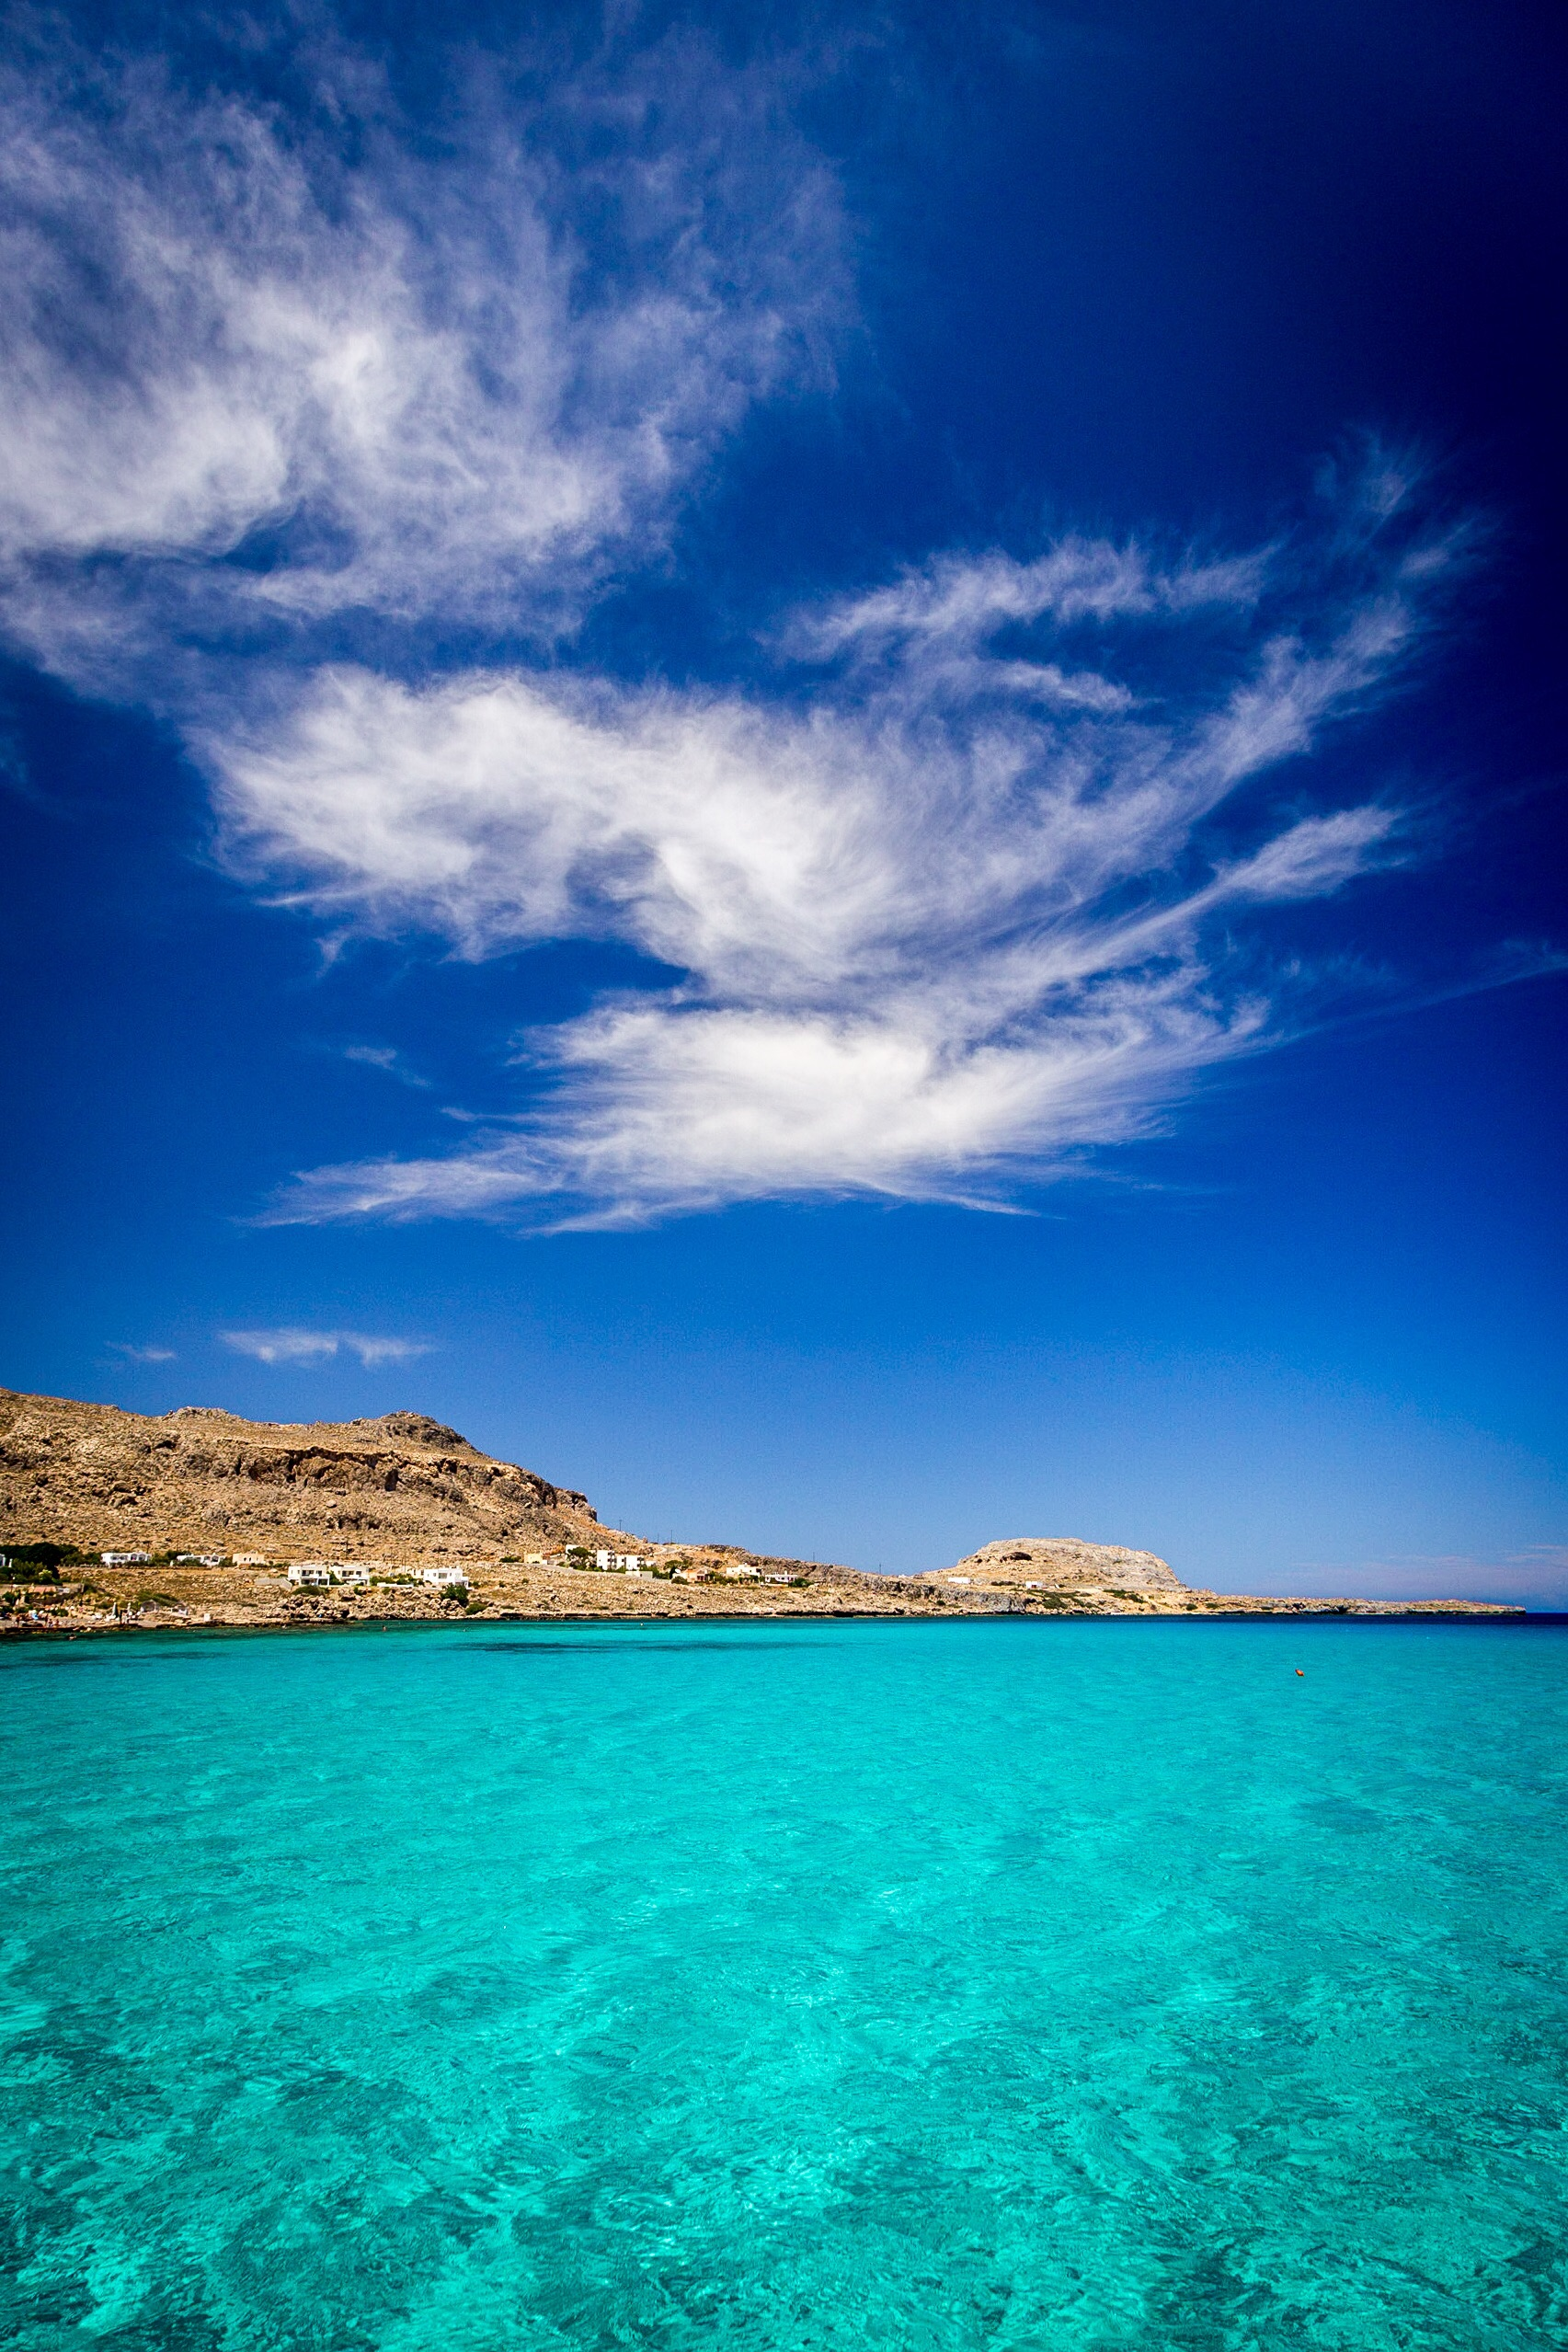 The aquamarine sea in Navarone Bay, Rhodes, Greece, by Rick McEvoy landscape photographer